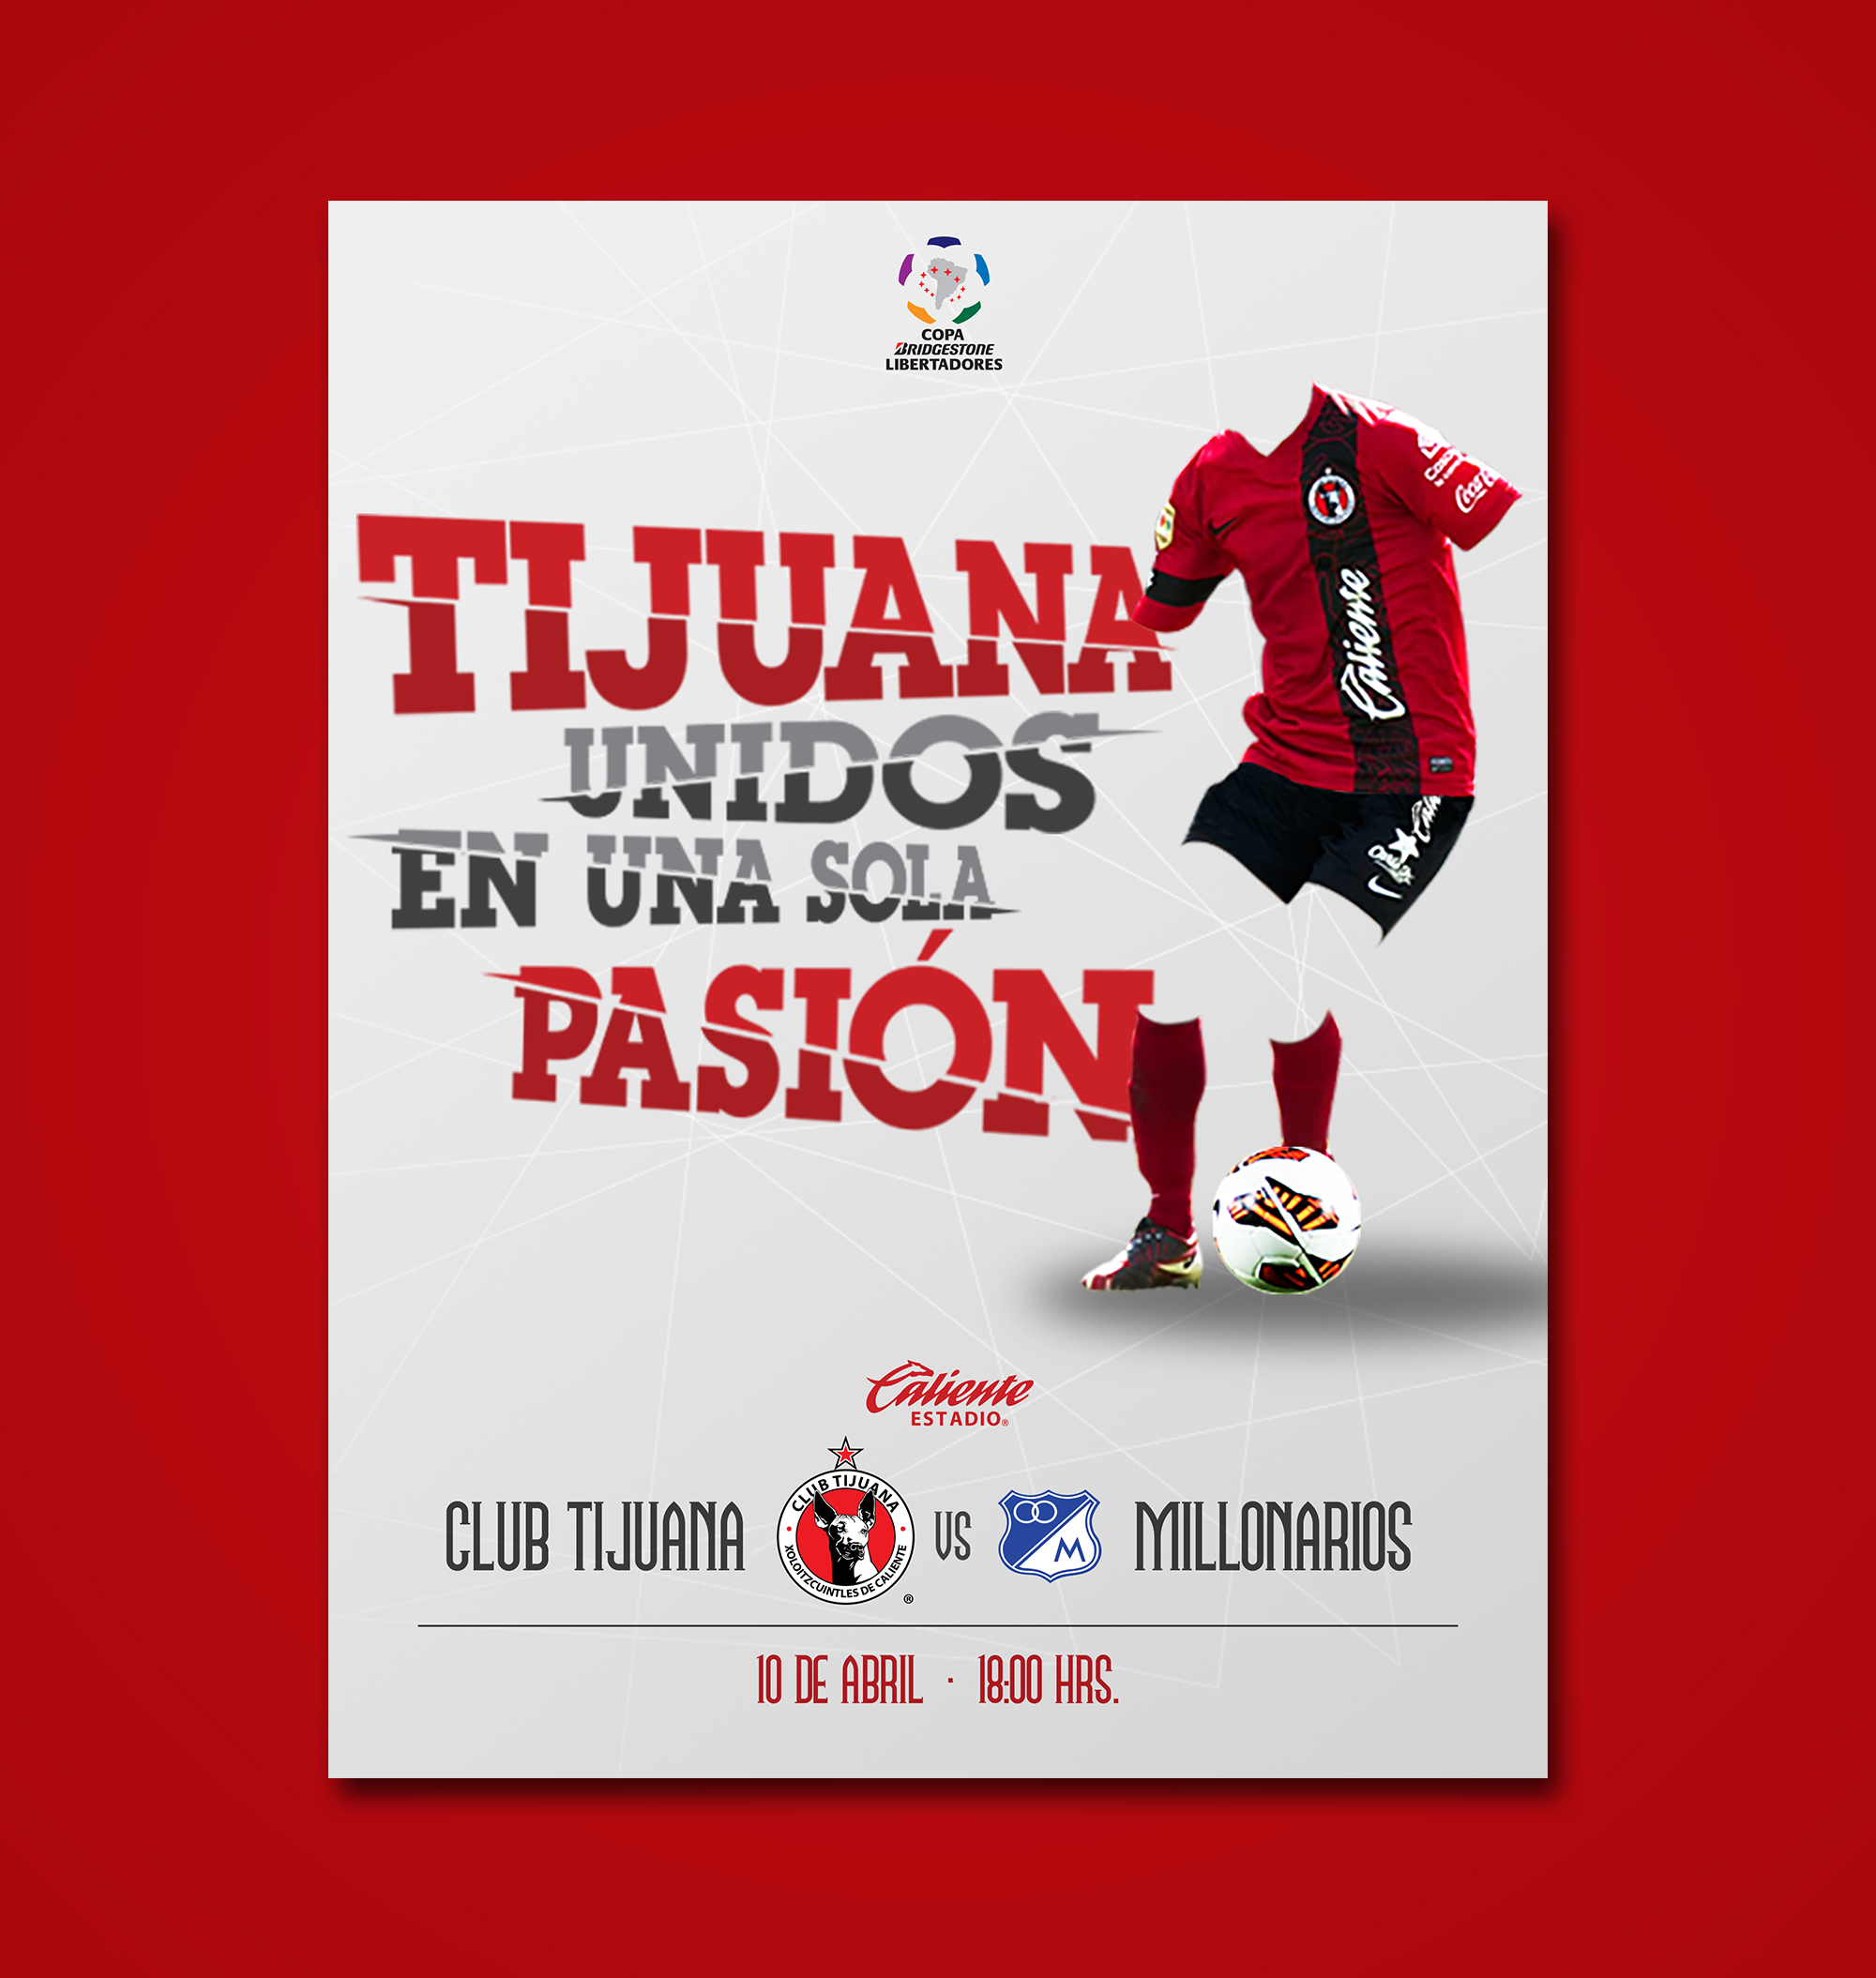 raniev-rod-alvarez-diseño-gráfico-queretaro-club-tijuana-4-vs-millonarios